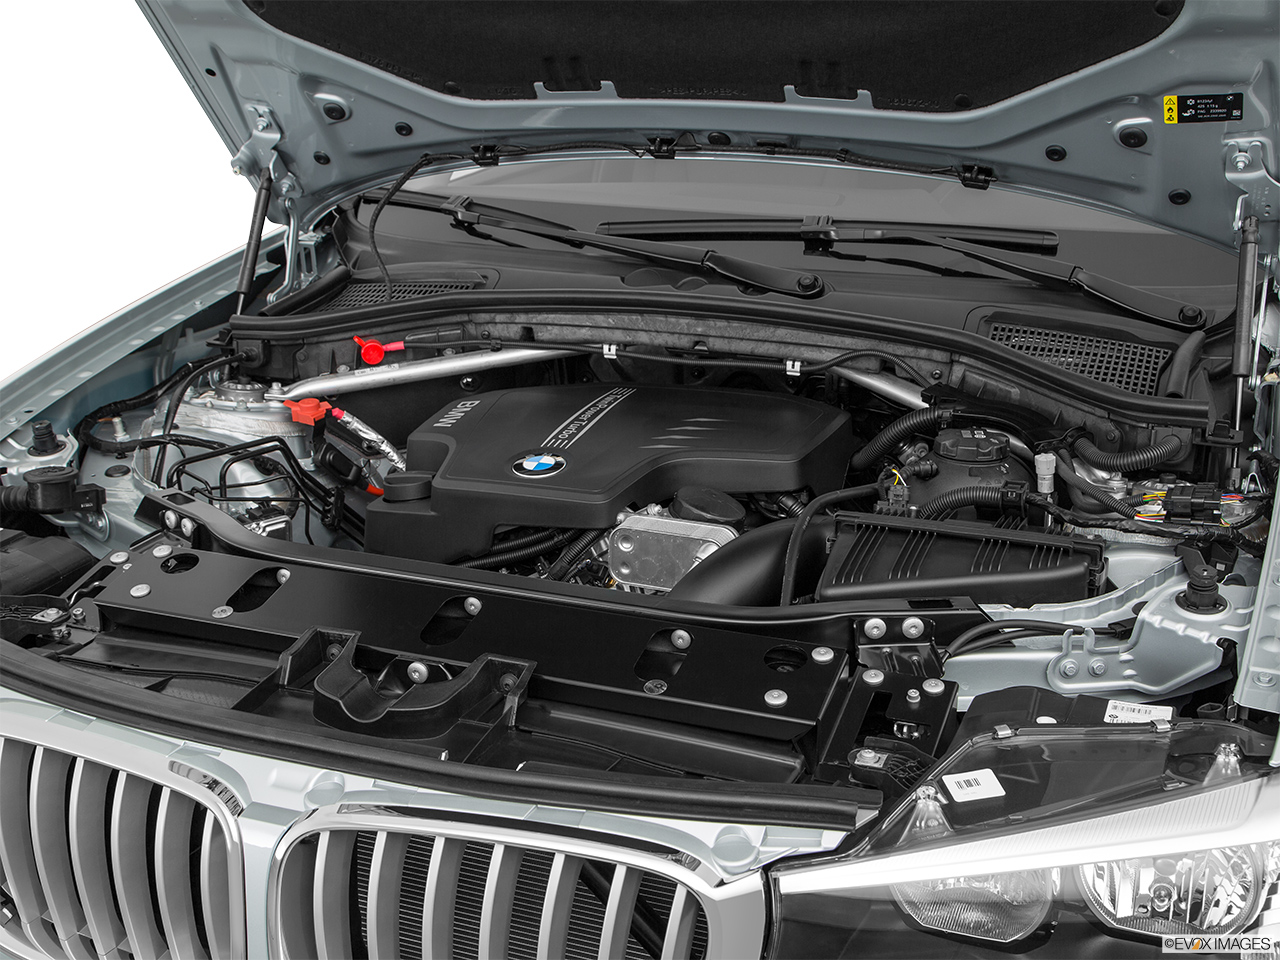 BMW X3 2017 XDrive 28i United Arab Emirates Engine